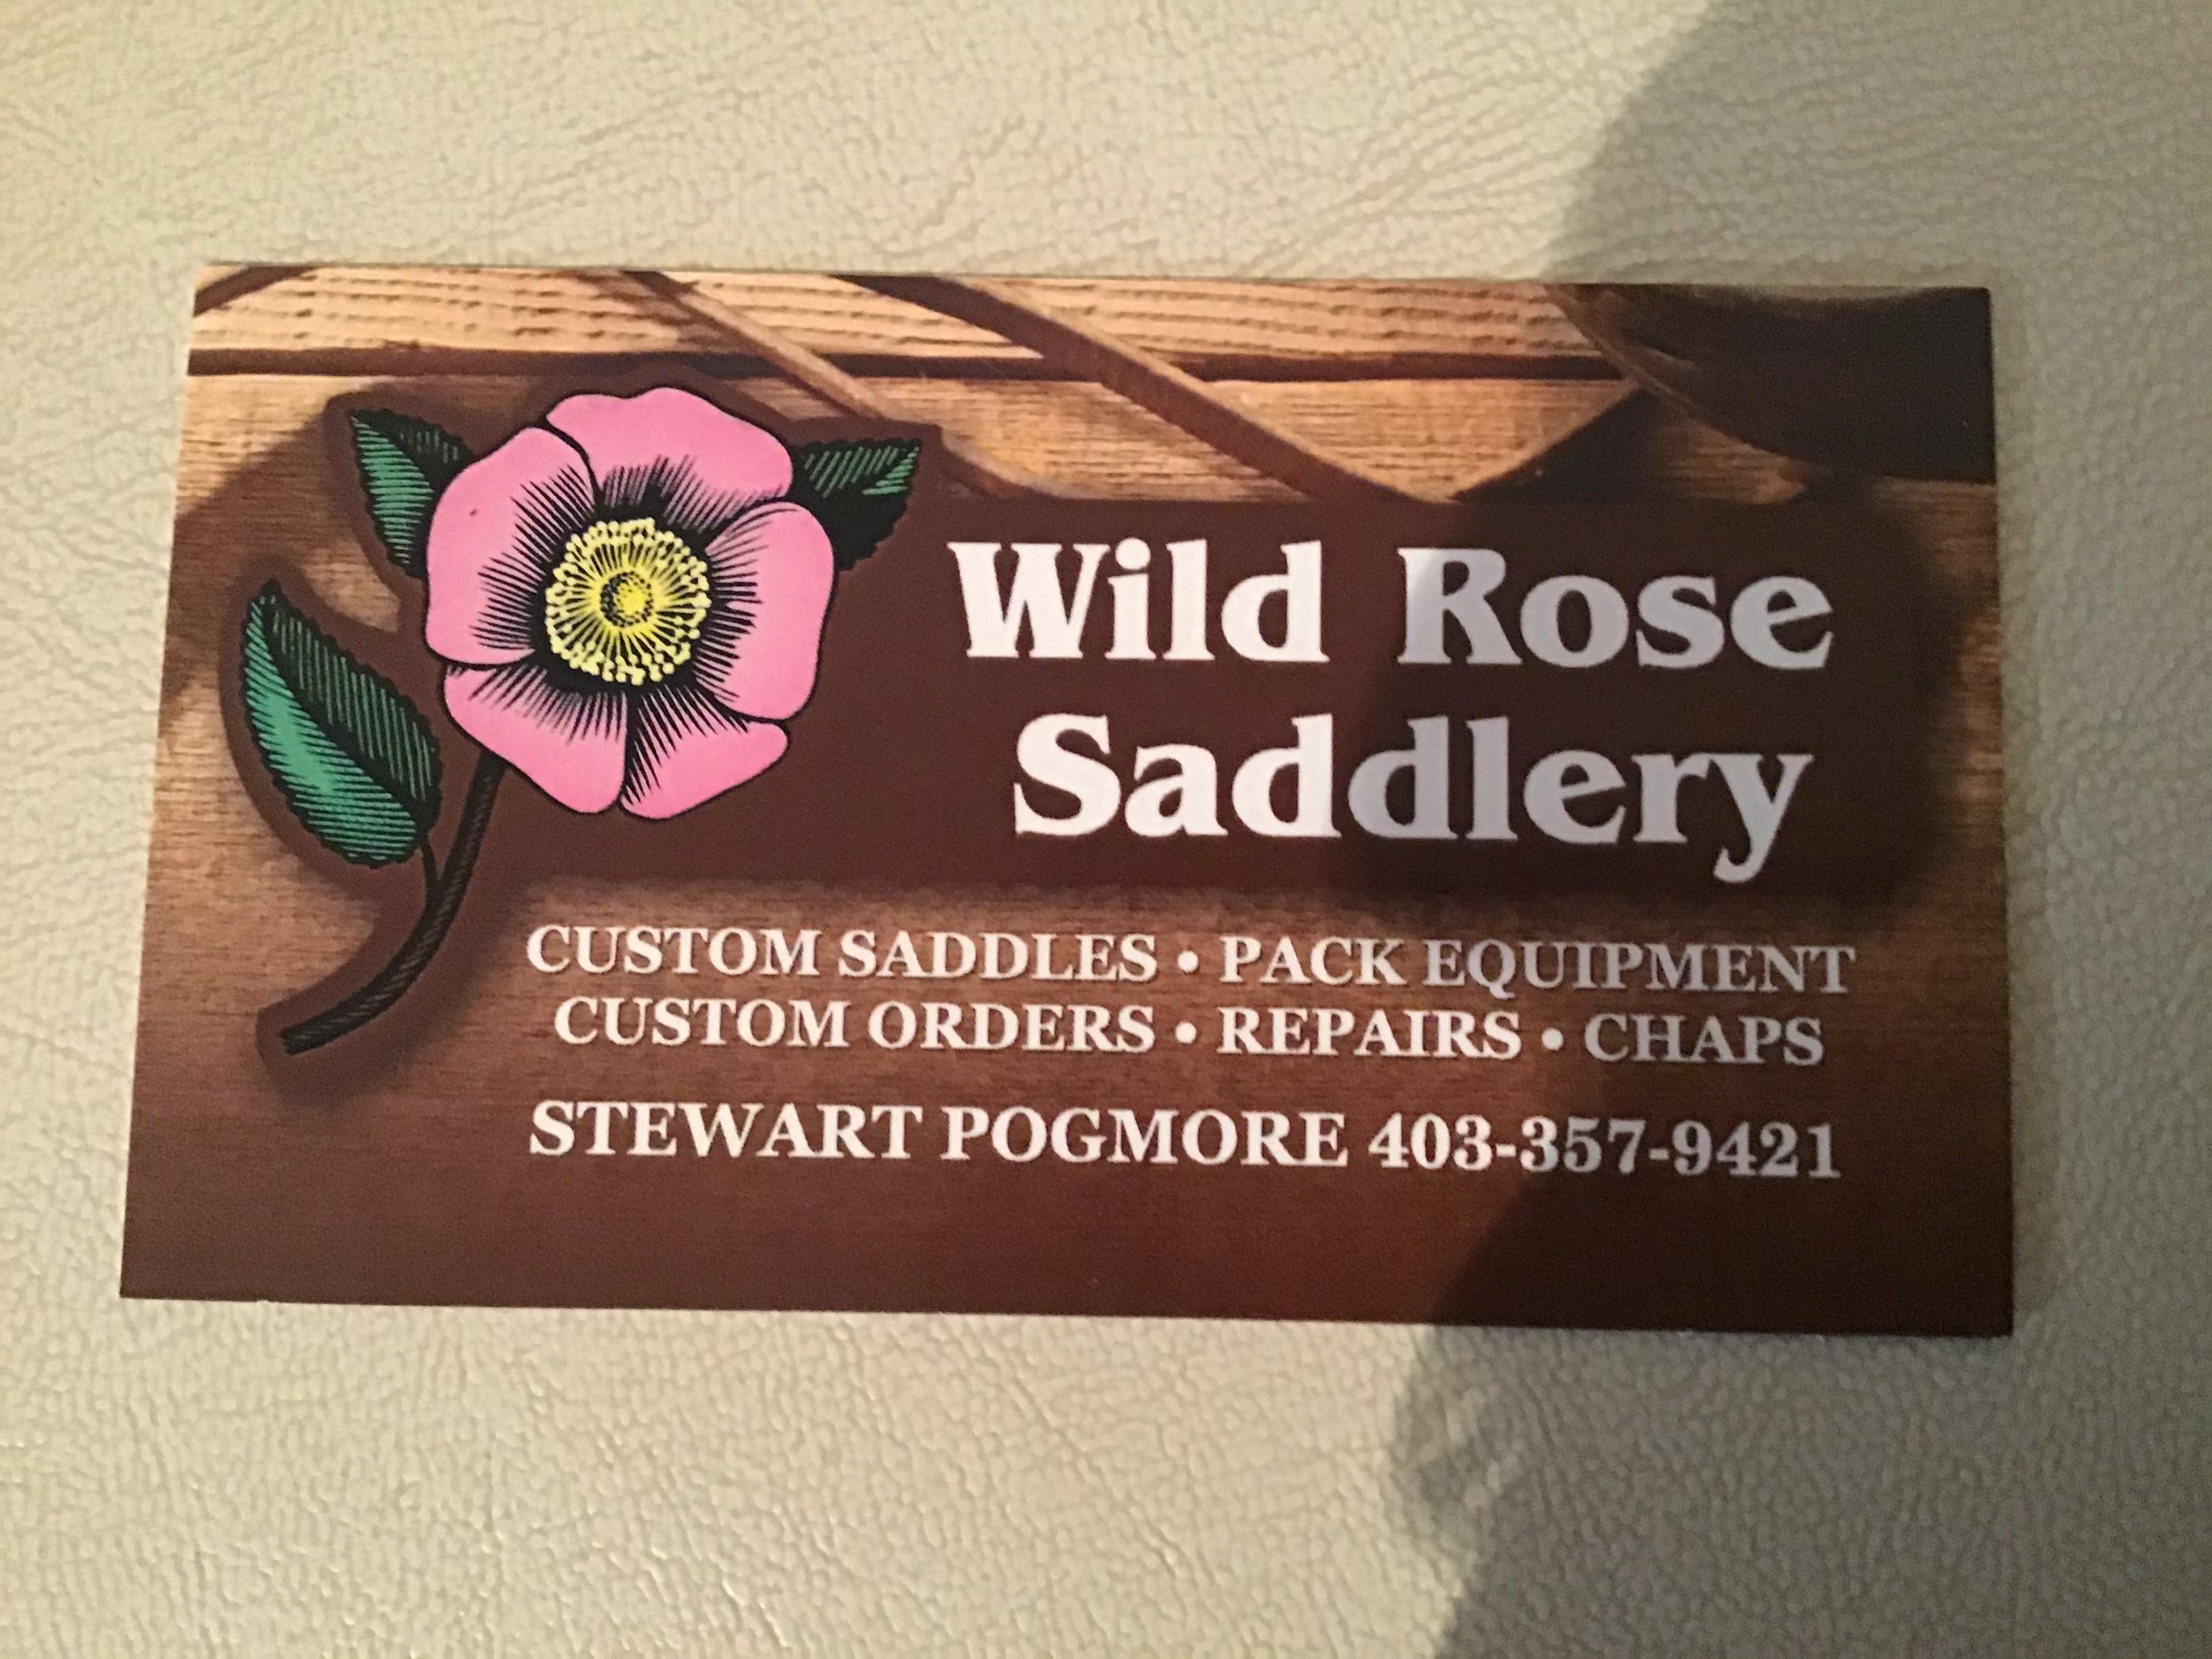 Wild Rose Saddlery